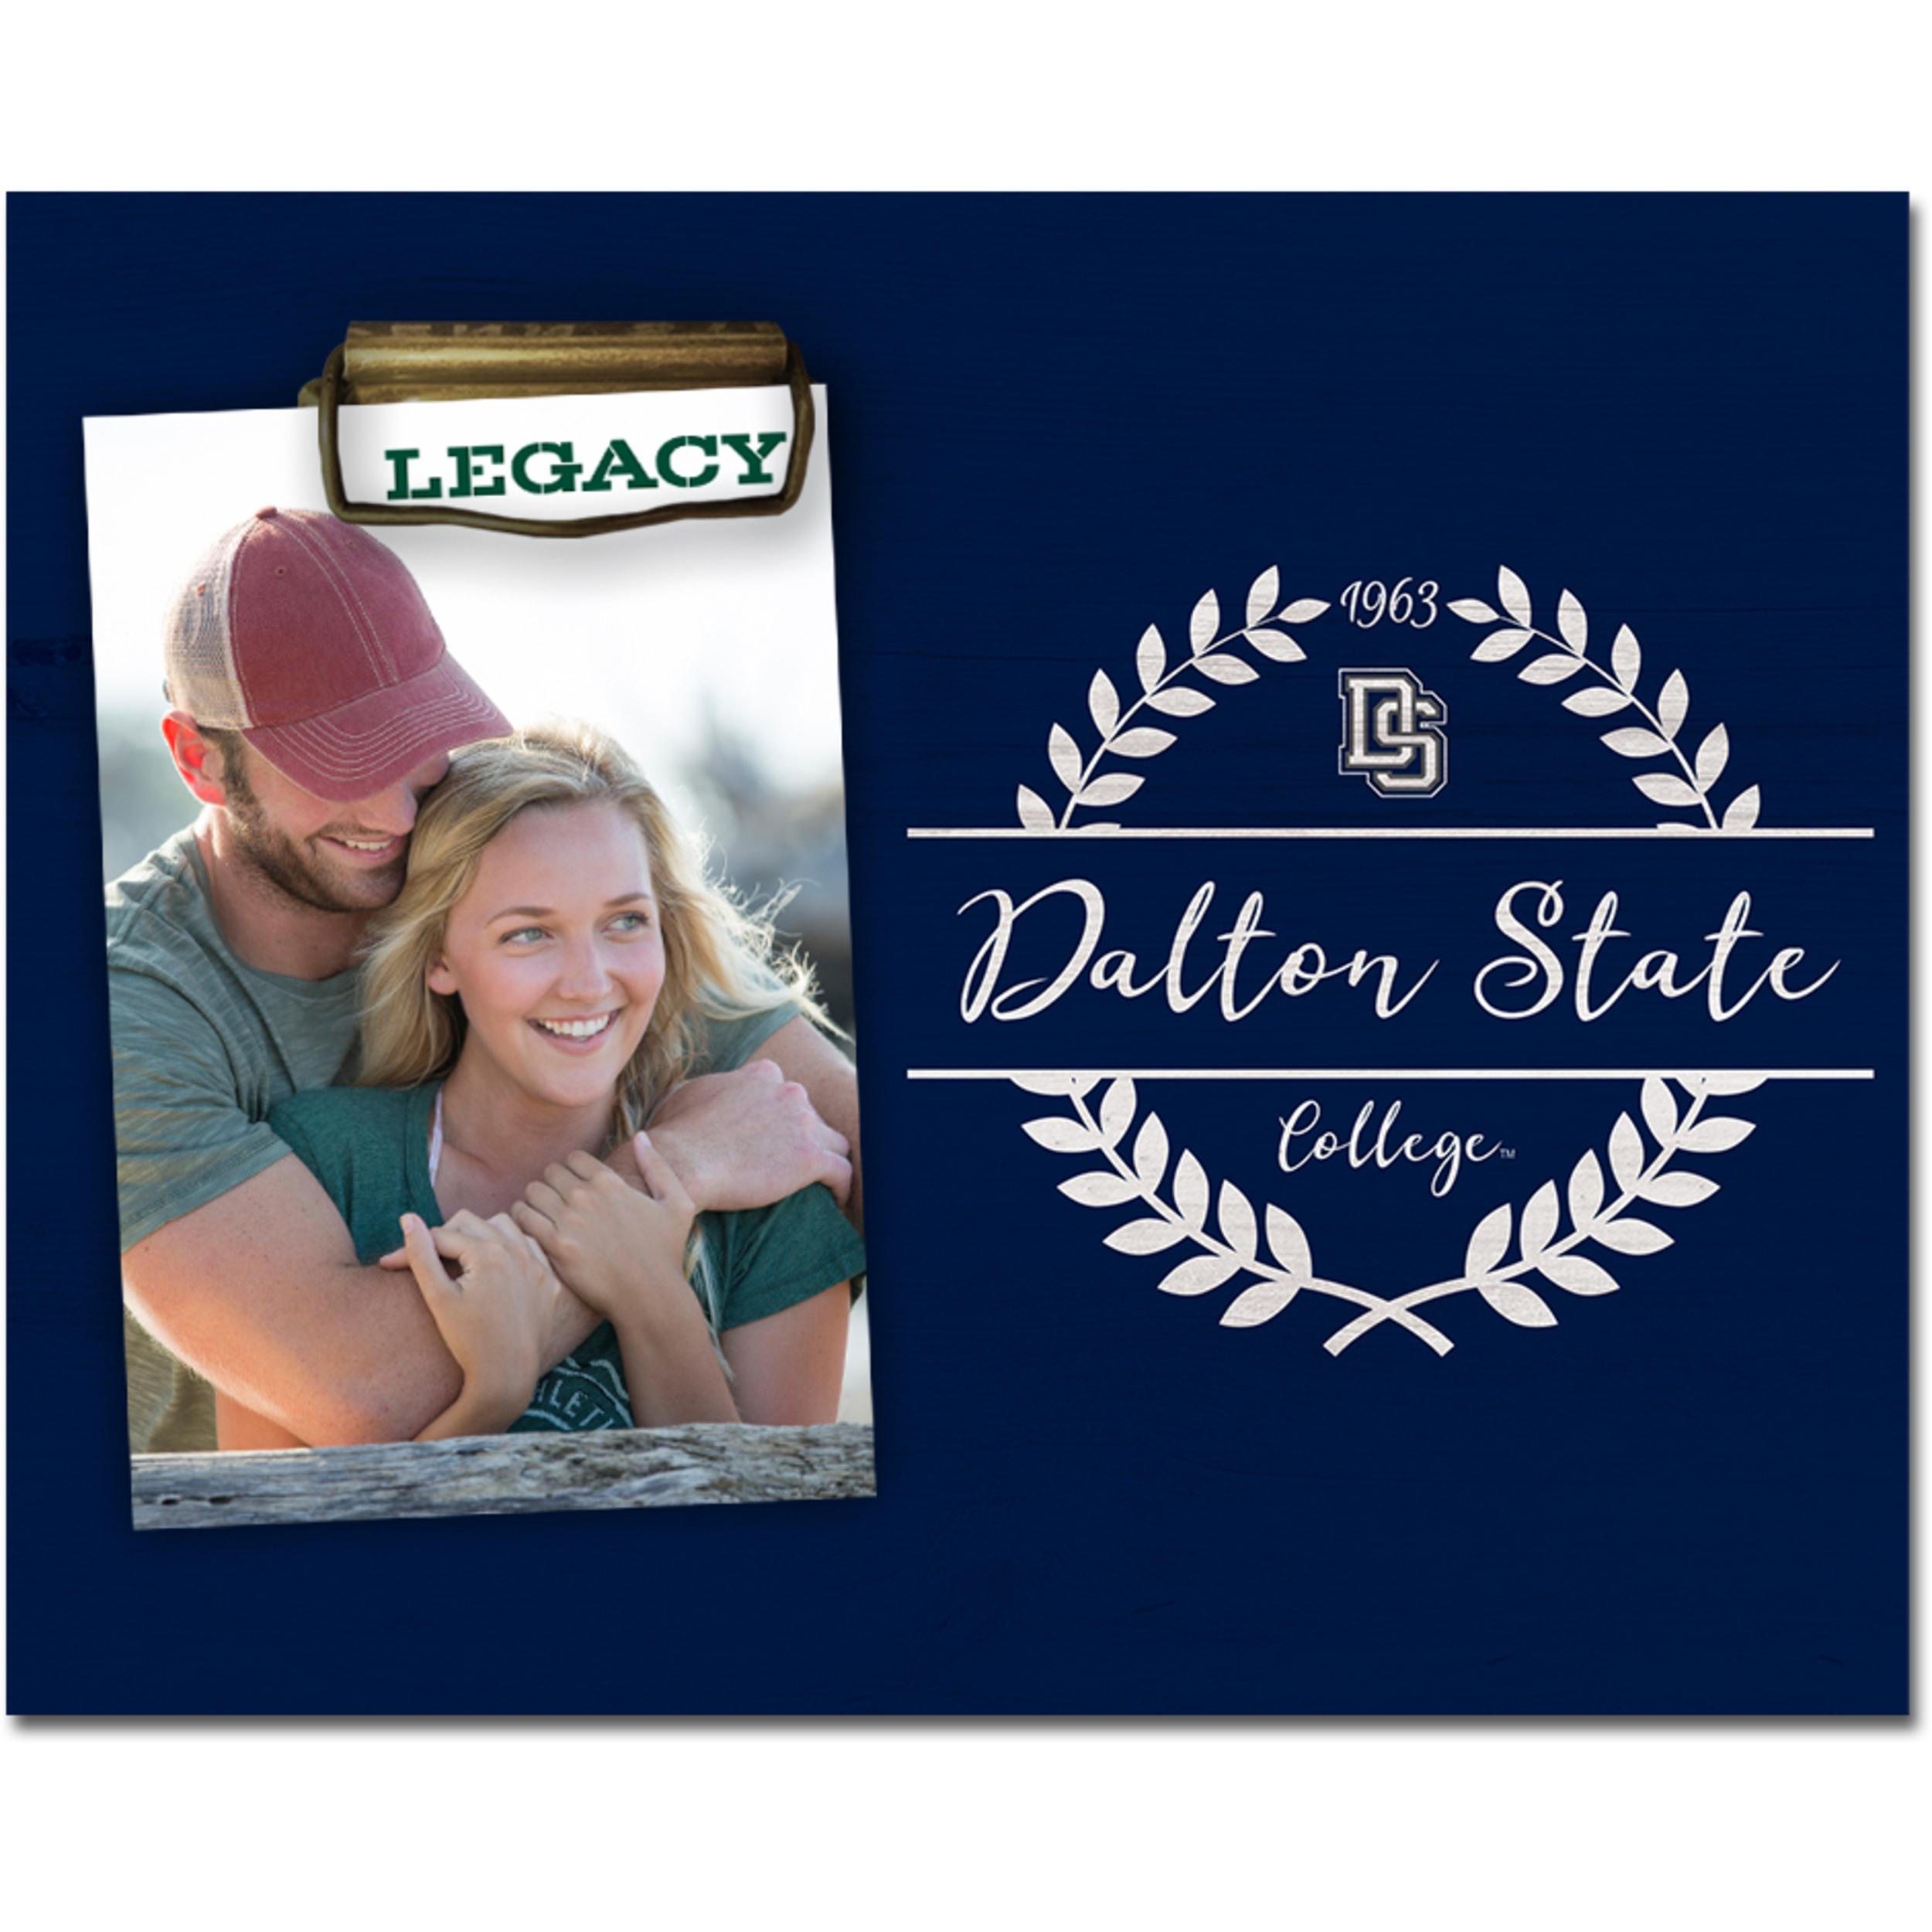 Dalton State Momento Photo Holder 8x10